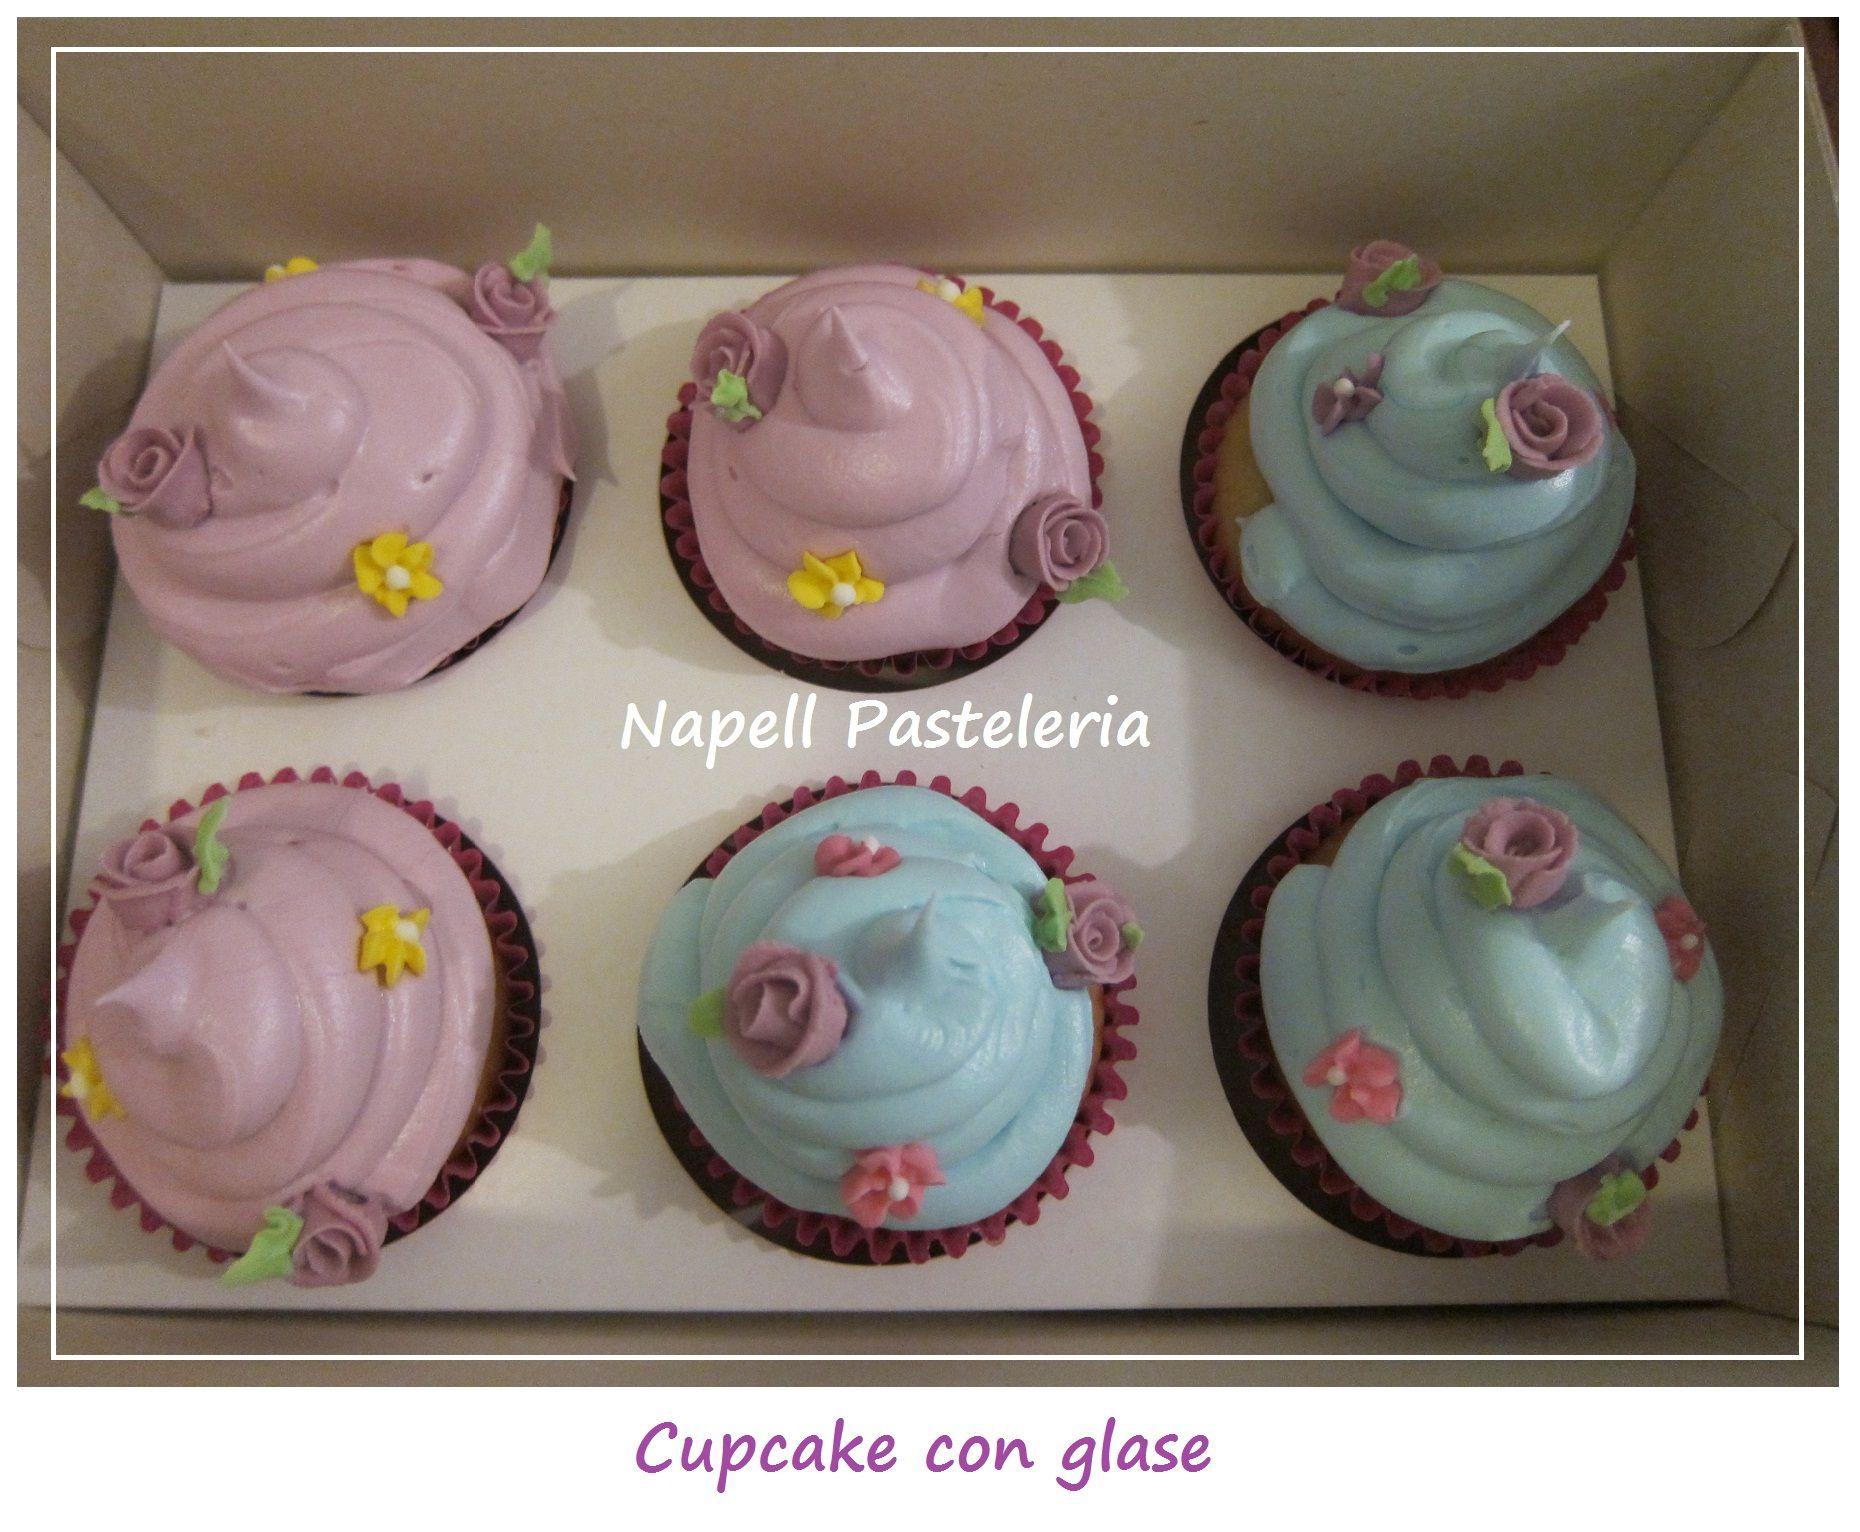 Cupcakes con glase